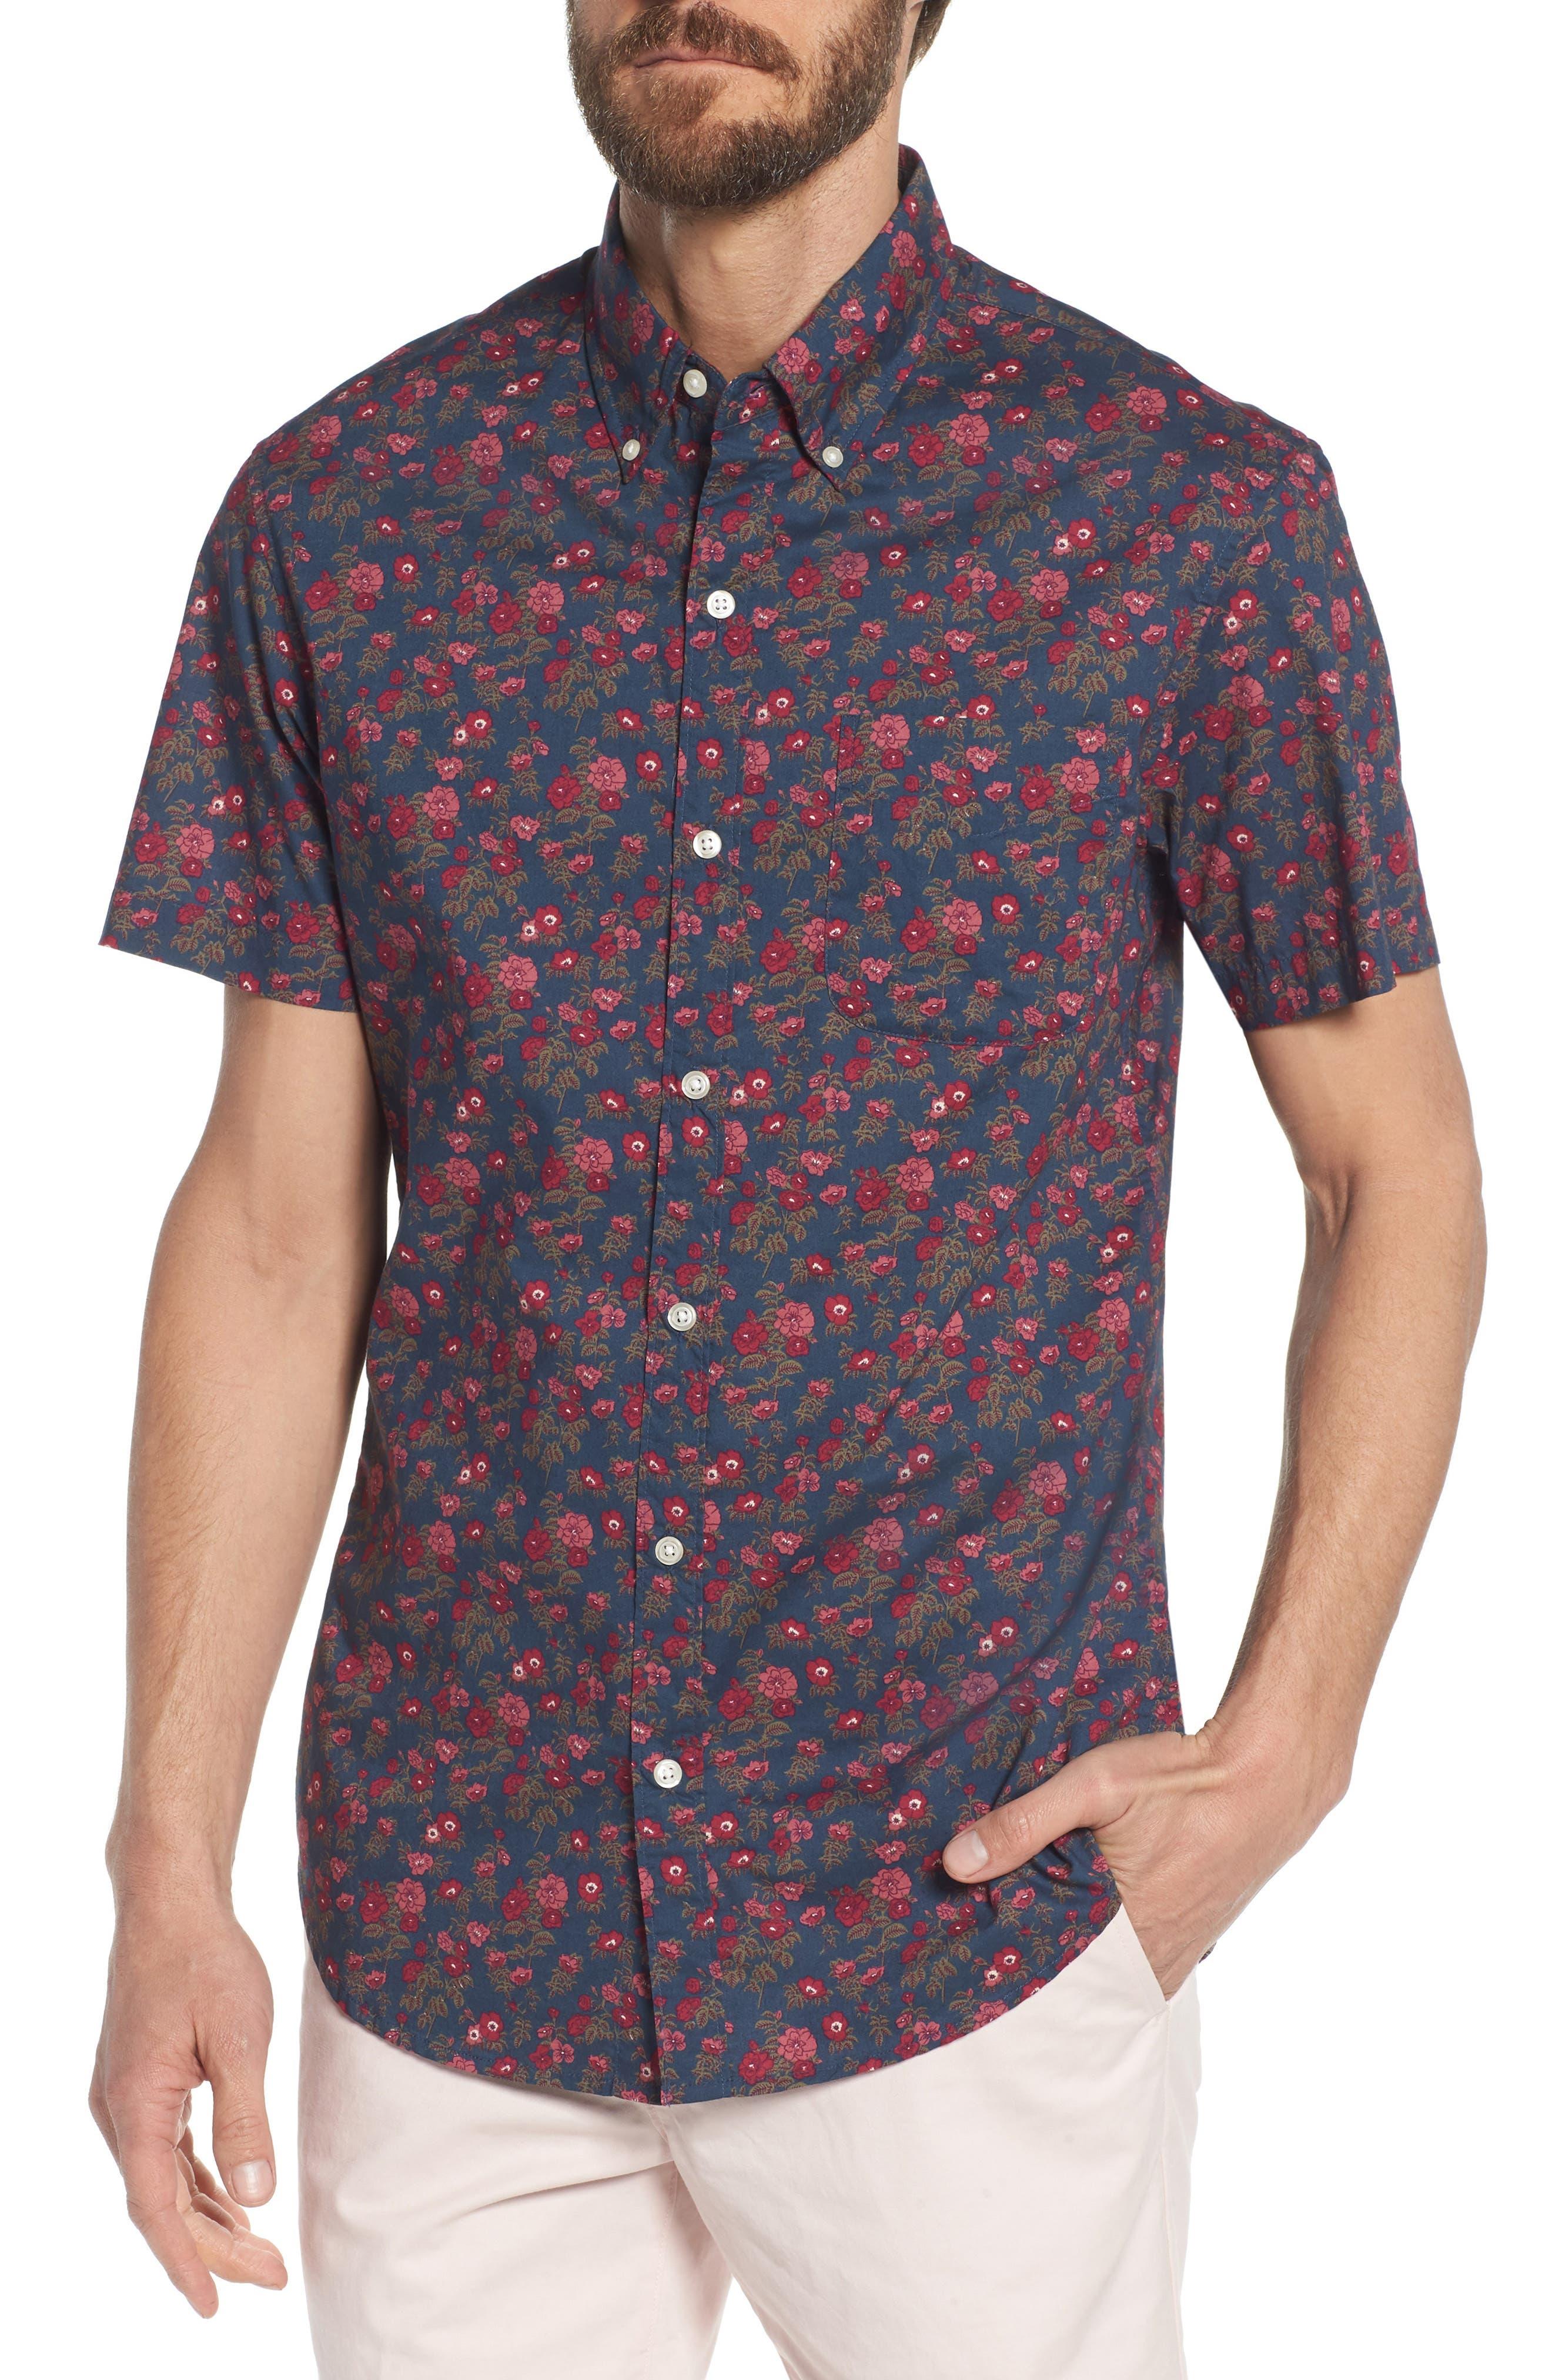 Riviera Slim Fit Floral Print Sport Shirt,                         Main,                         color, Dandy Floral - Pickled Beet